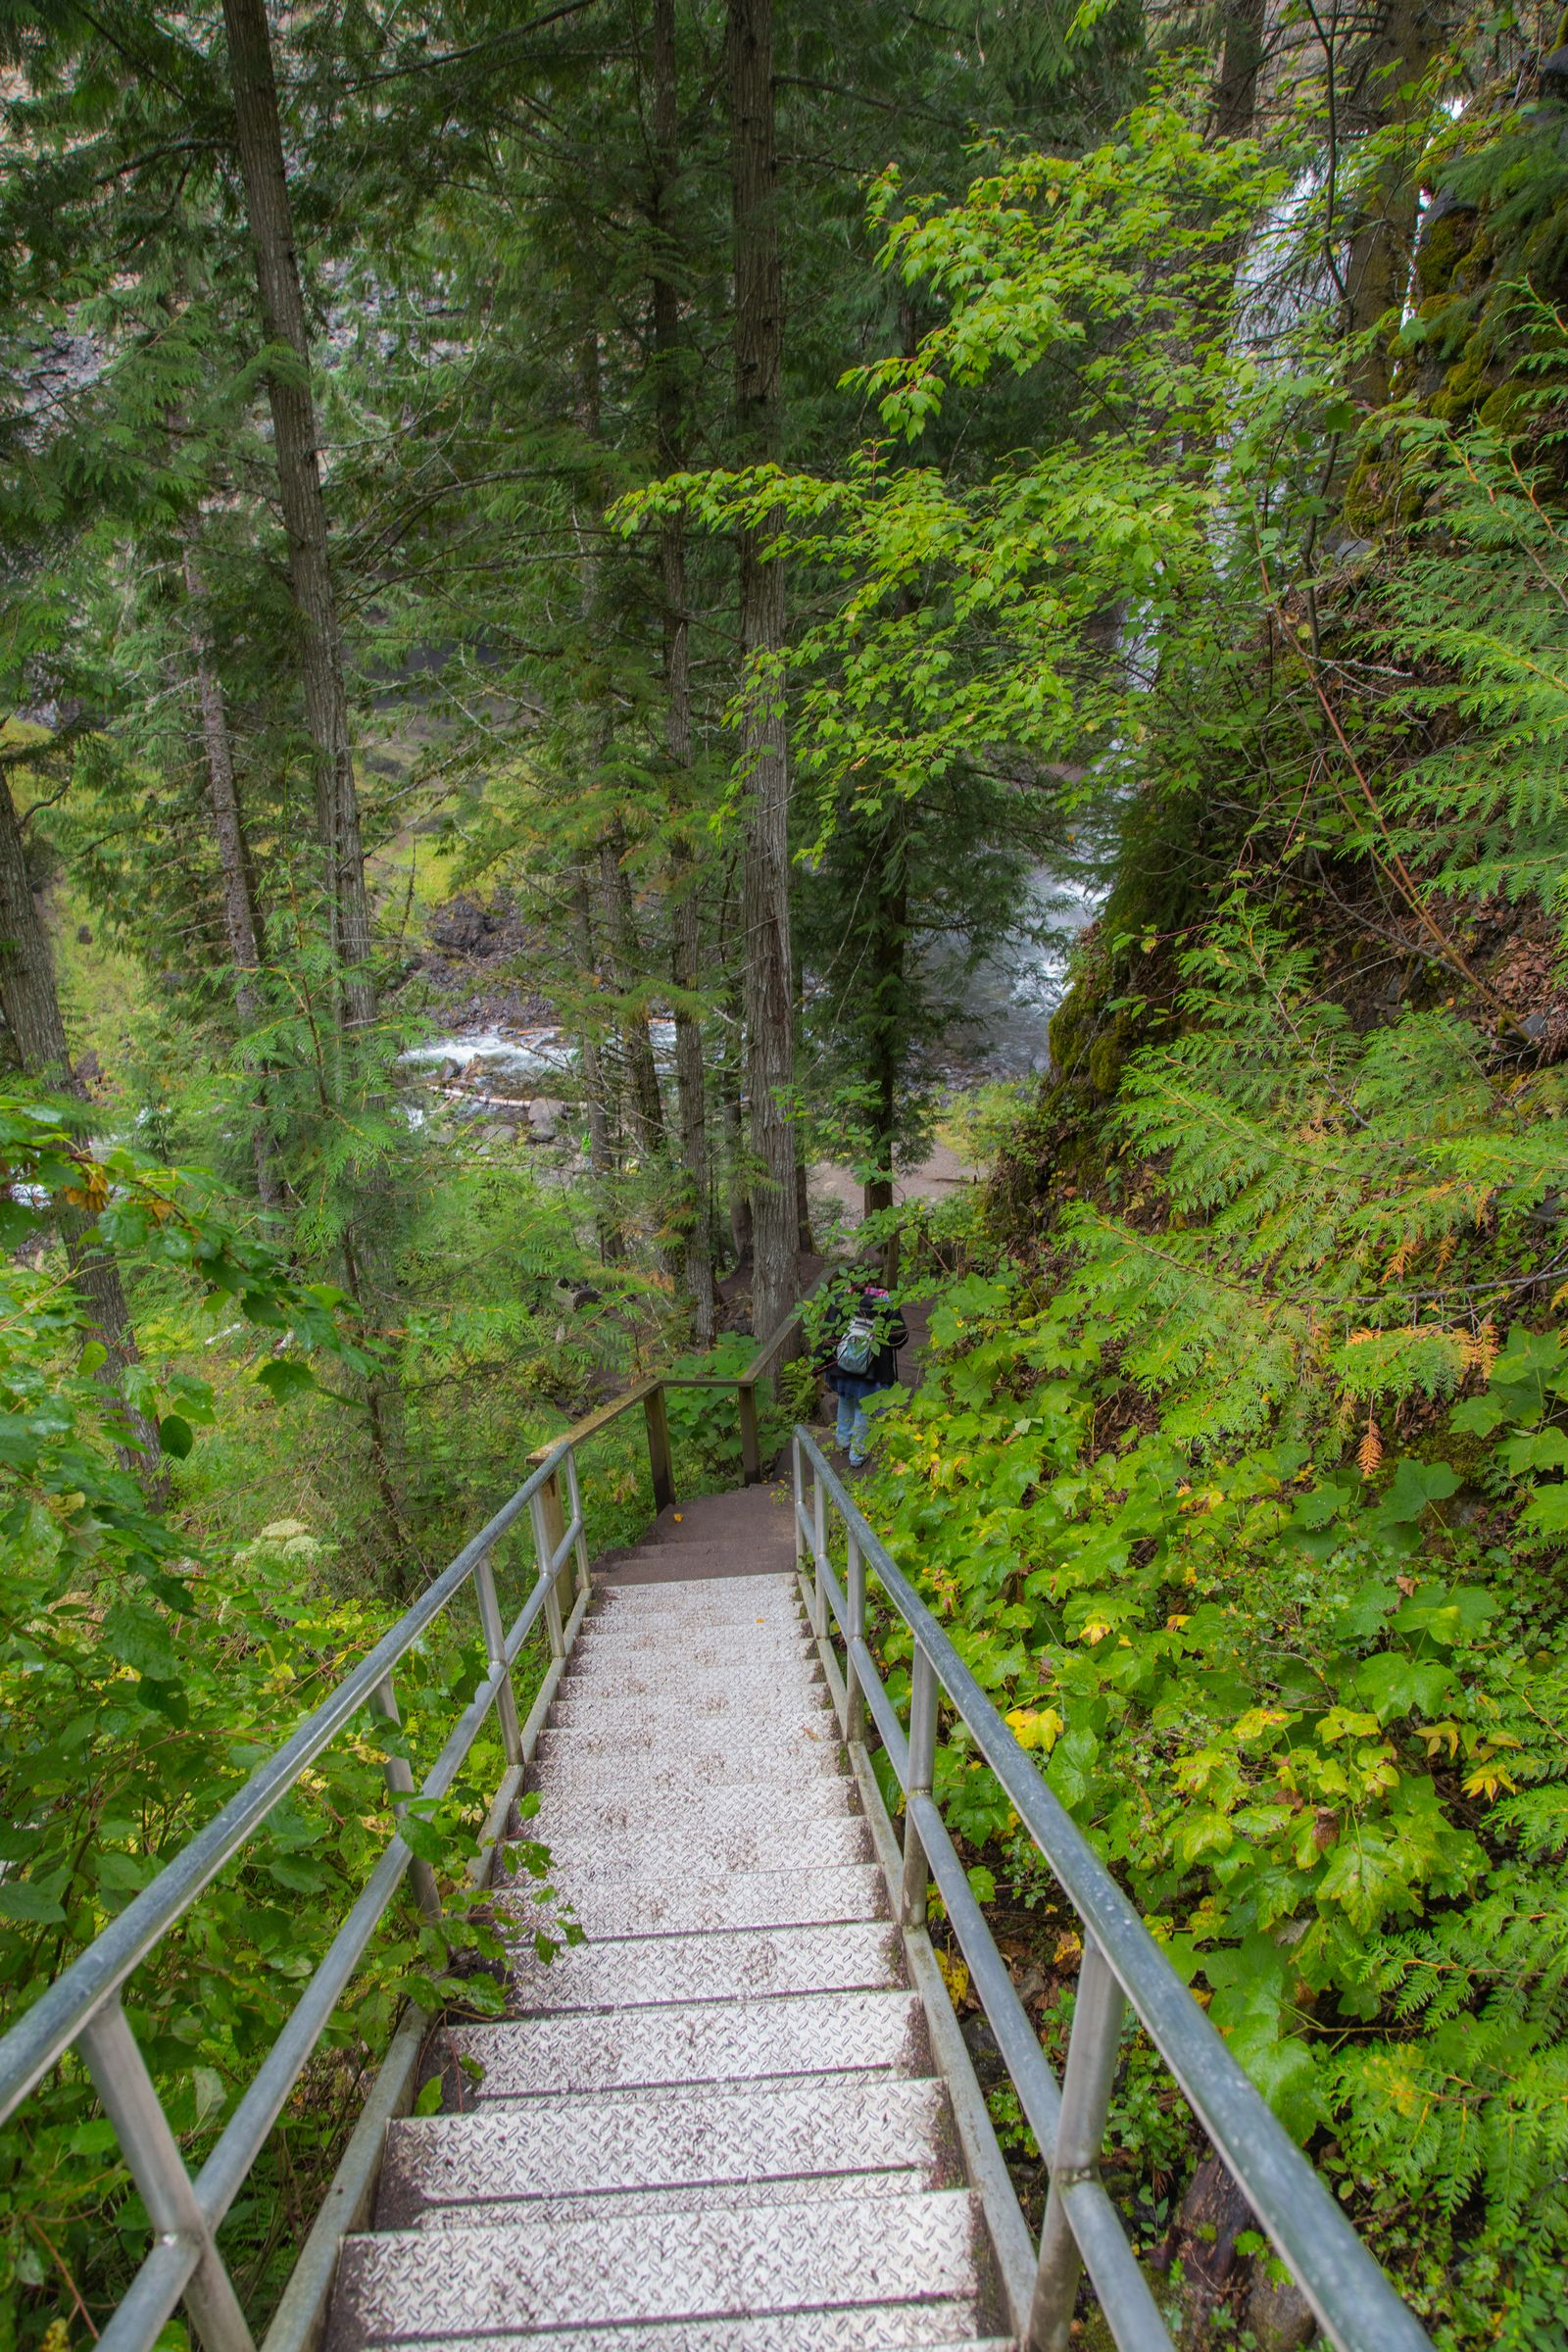 La escalera que lleva a la orilla